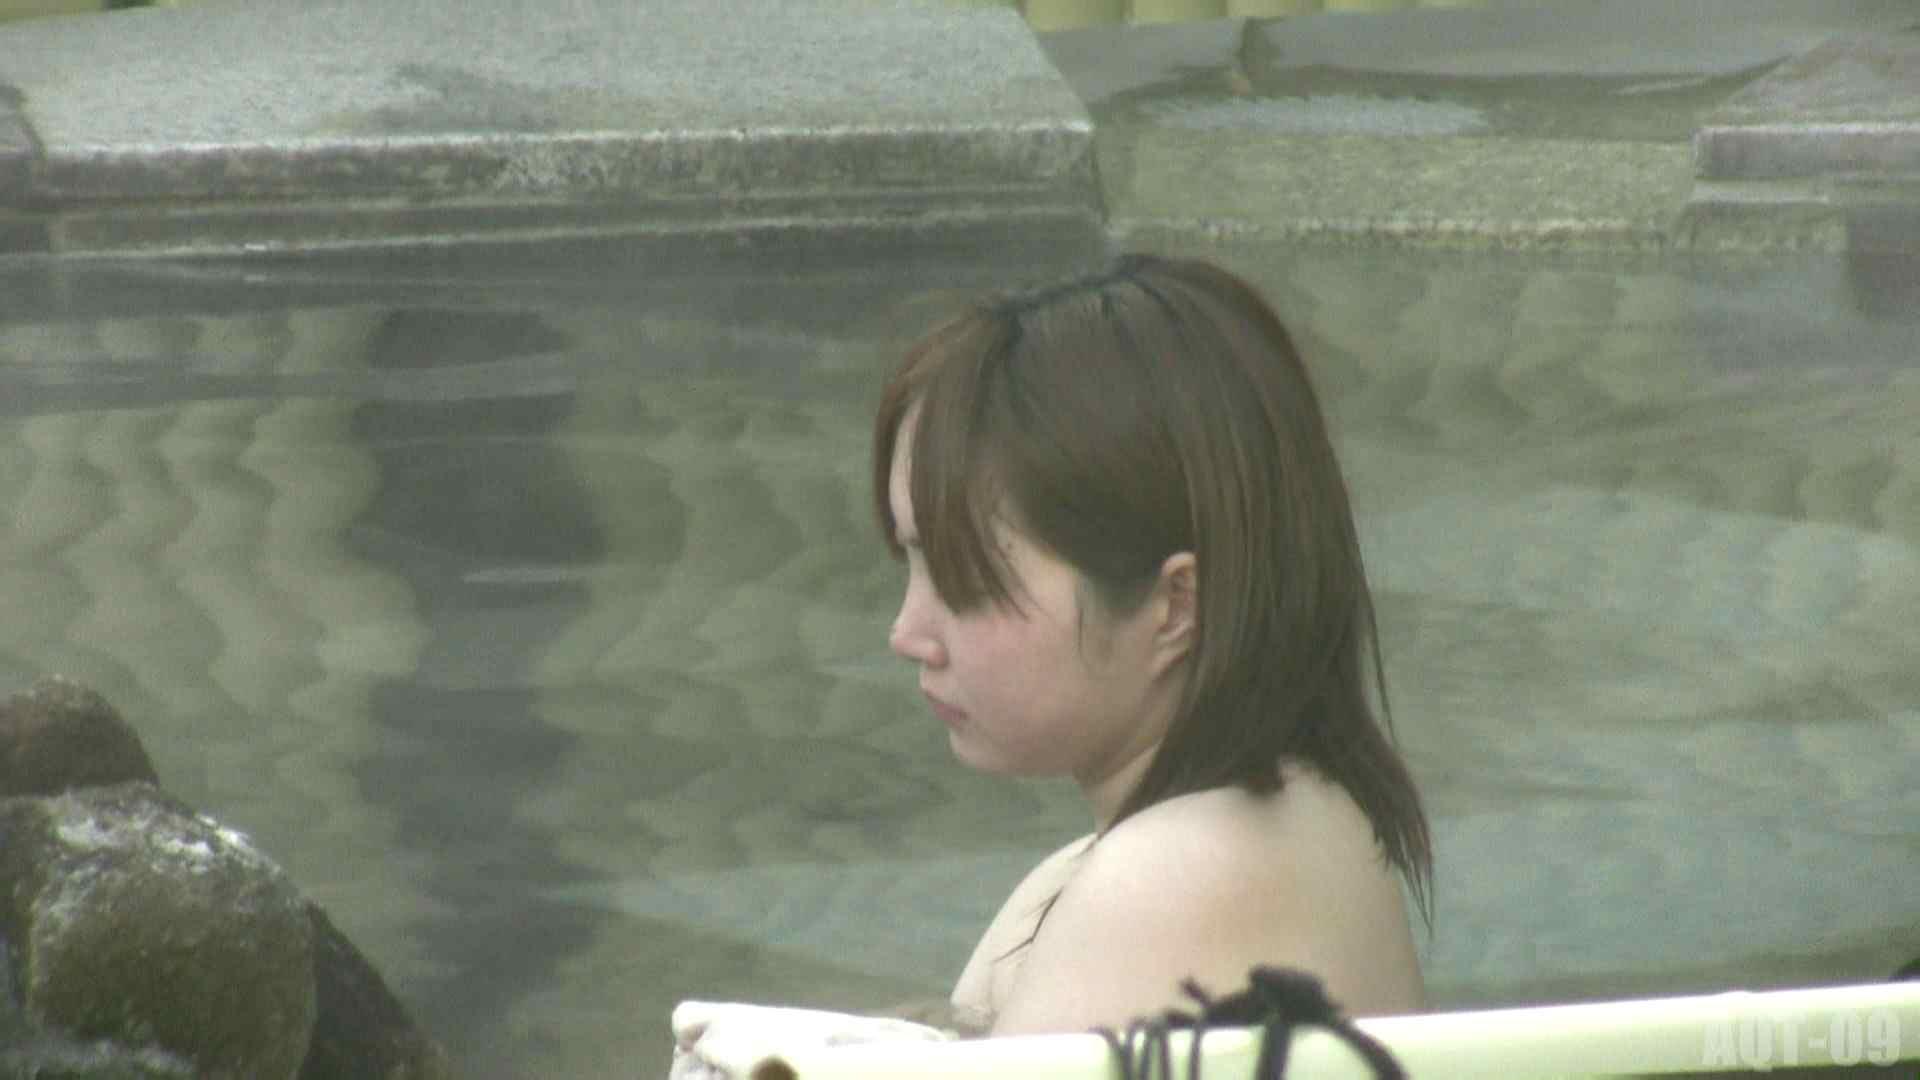 Aquaな露天風呂Vol.781 0 | 0  48連発 21